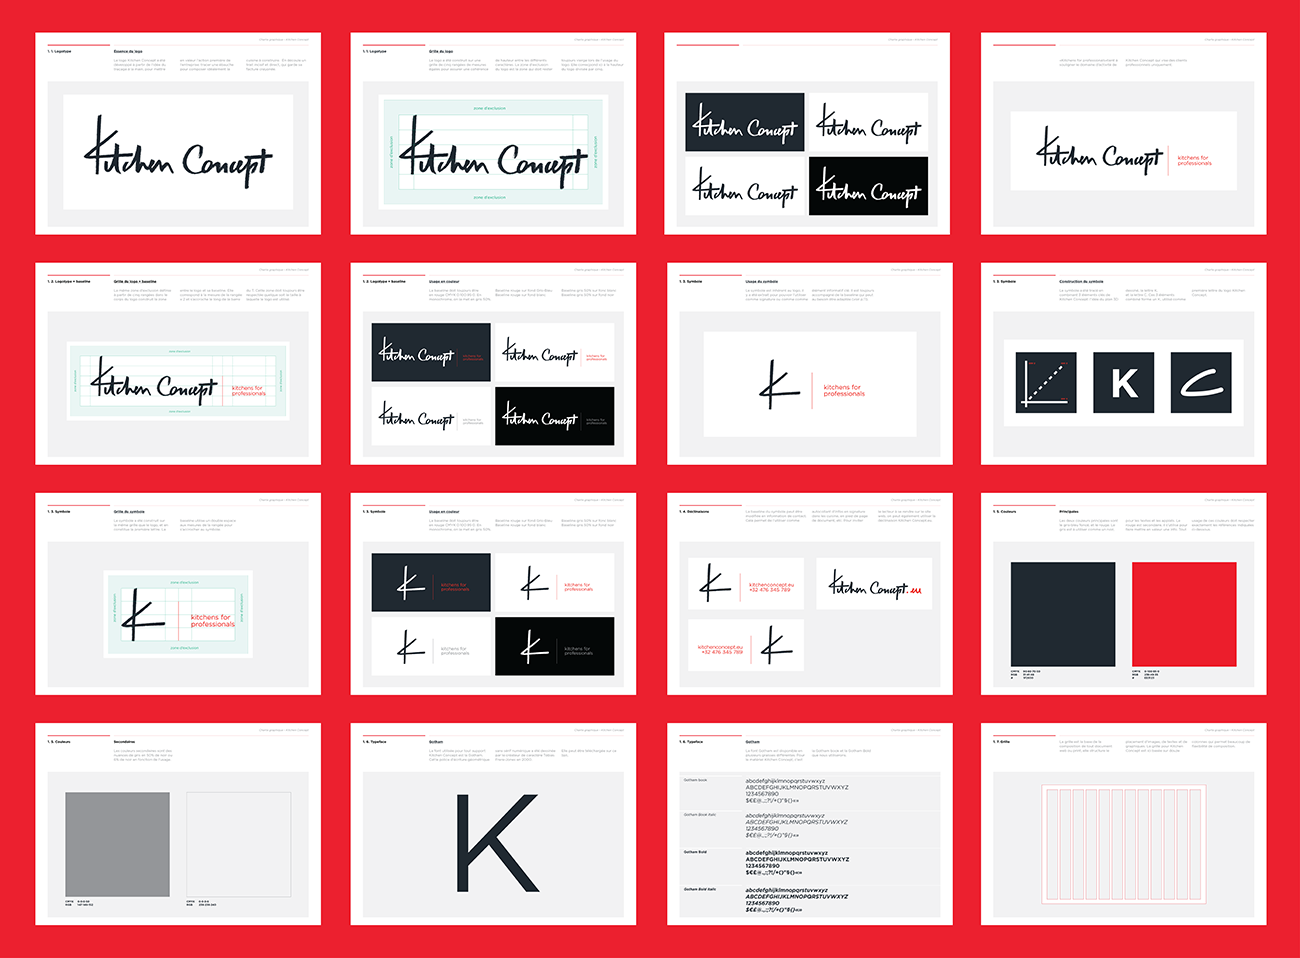 Vlevle-Kitchen_Concept-Visual_Identity-logo-guidelines-graphic_design-gaelle_de_laveleye